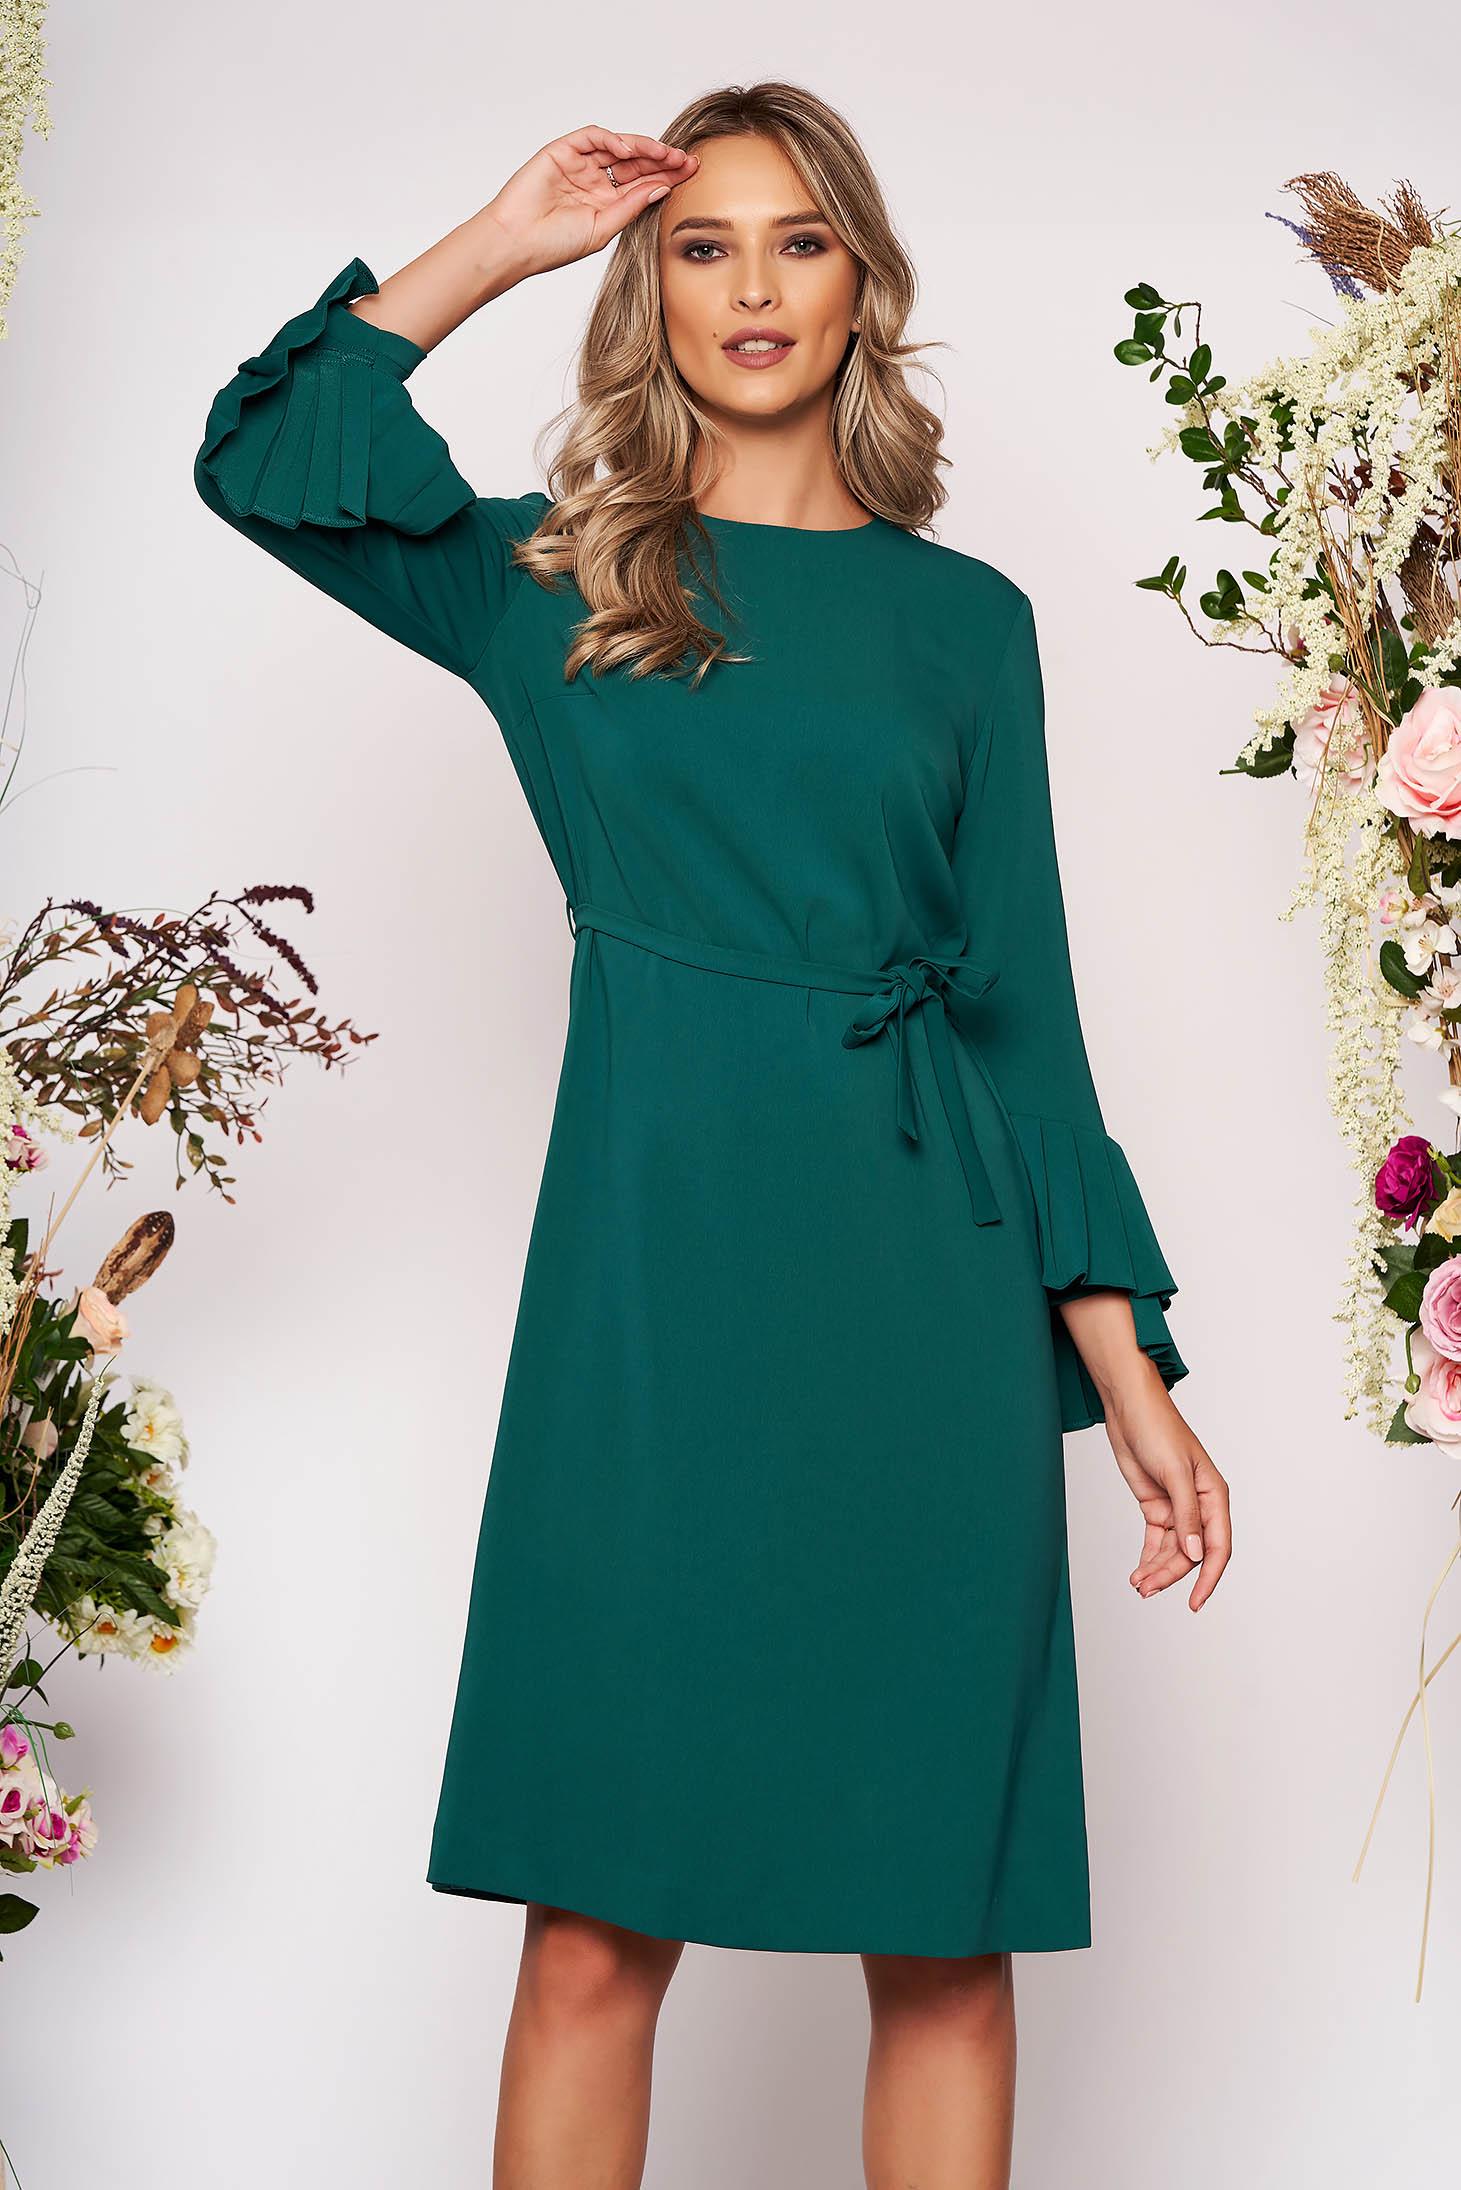 Rochie verde eleganta midi din stofa cu croi larg cu maneci lungi si cordon detasabil